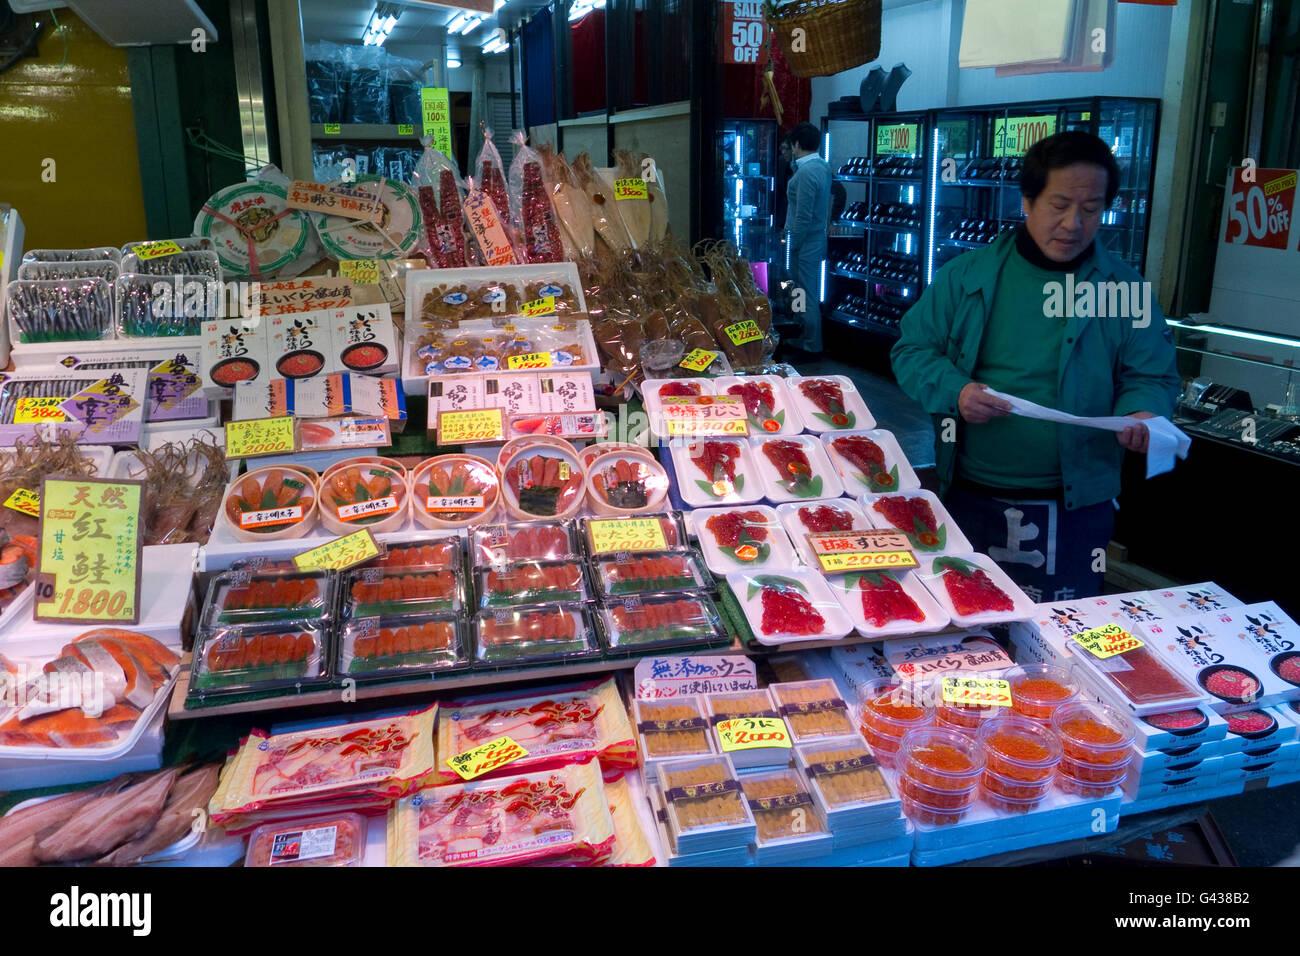 The popular Ameya Yokocho market in Tokyo, Japan    Credit © Fabio Mazzarella/Sintesi/Alamy Stock Photo Stock Photo